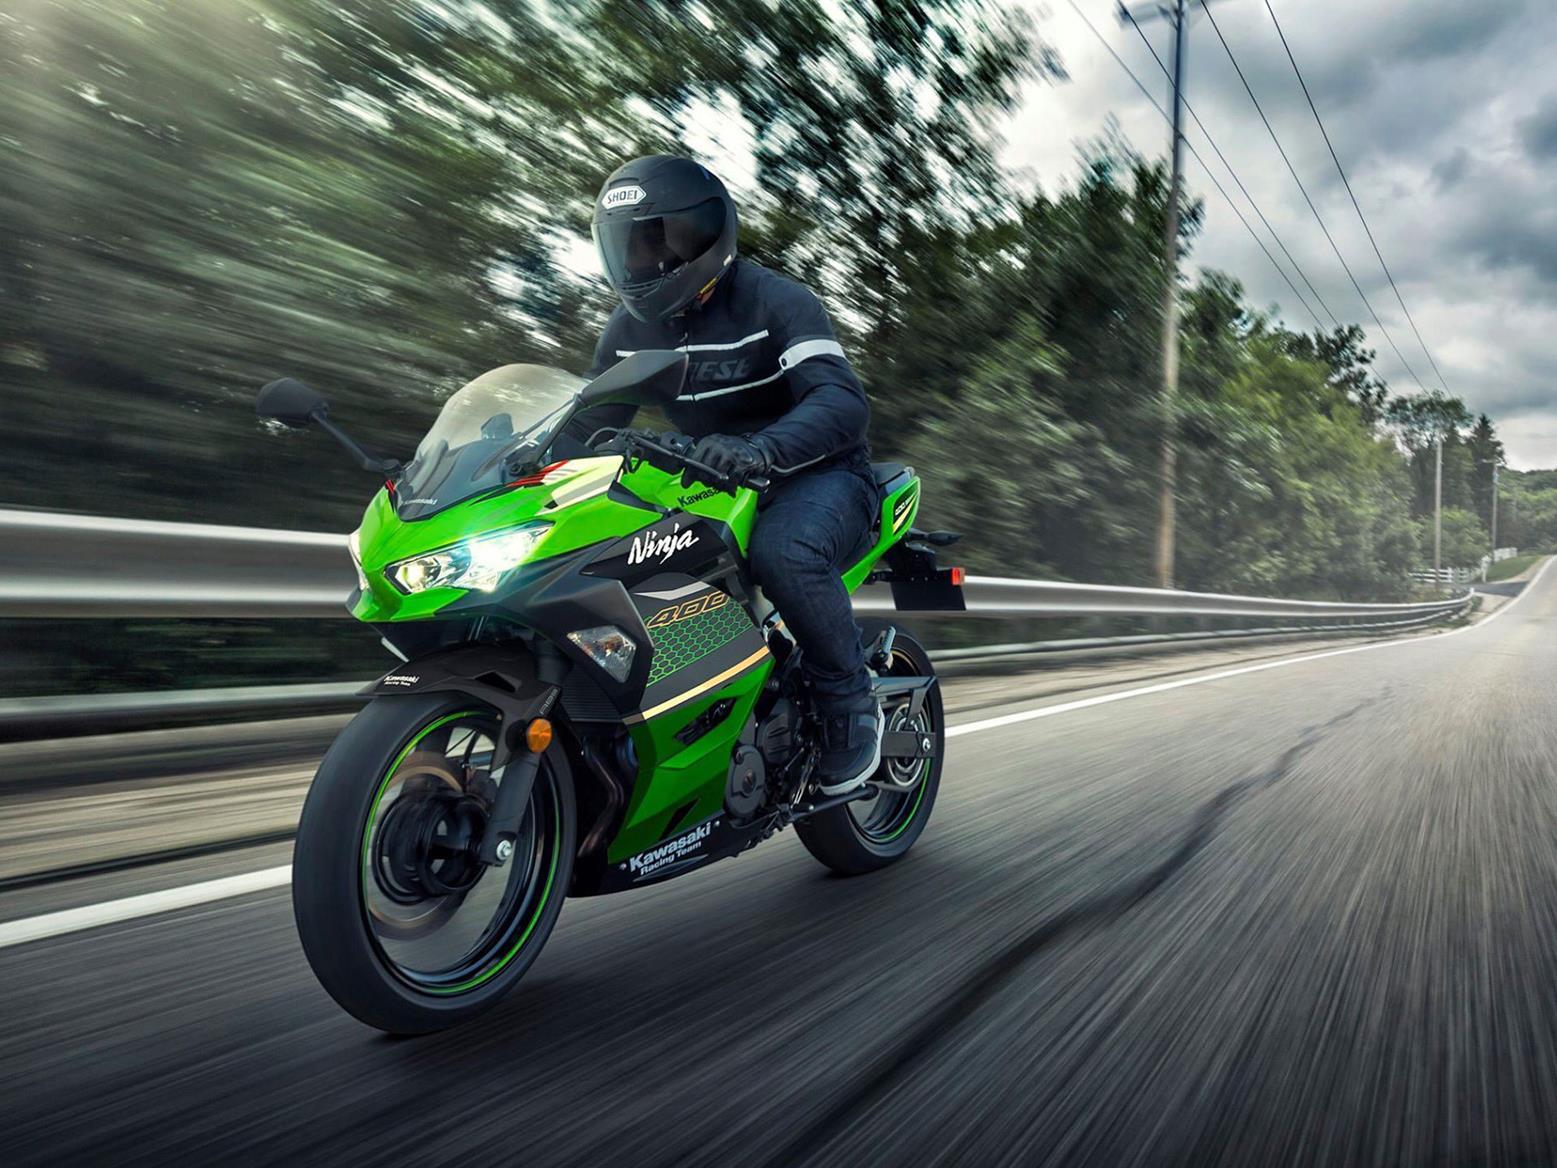 Kawasaki Ninja 400 in Racing Team livery for 2020